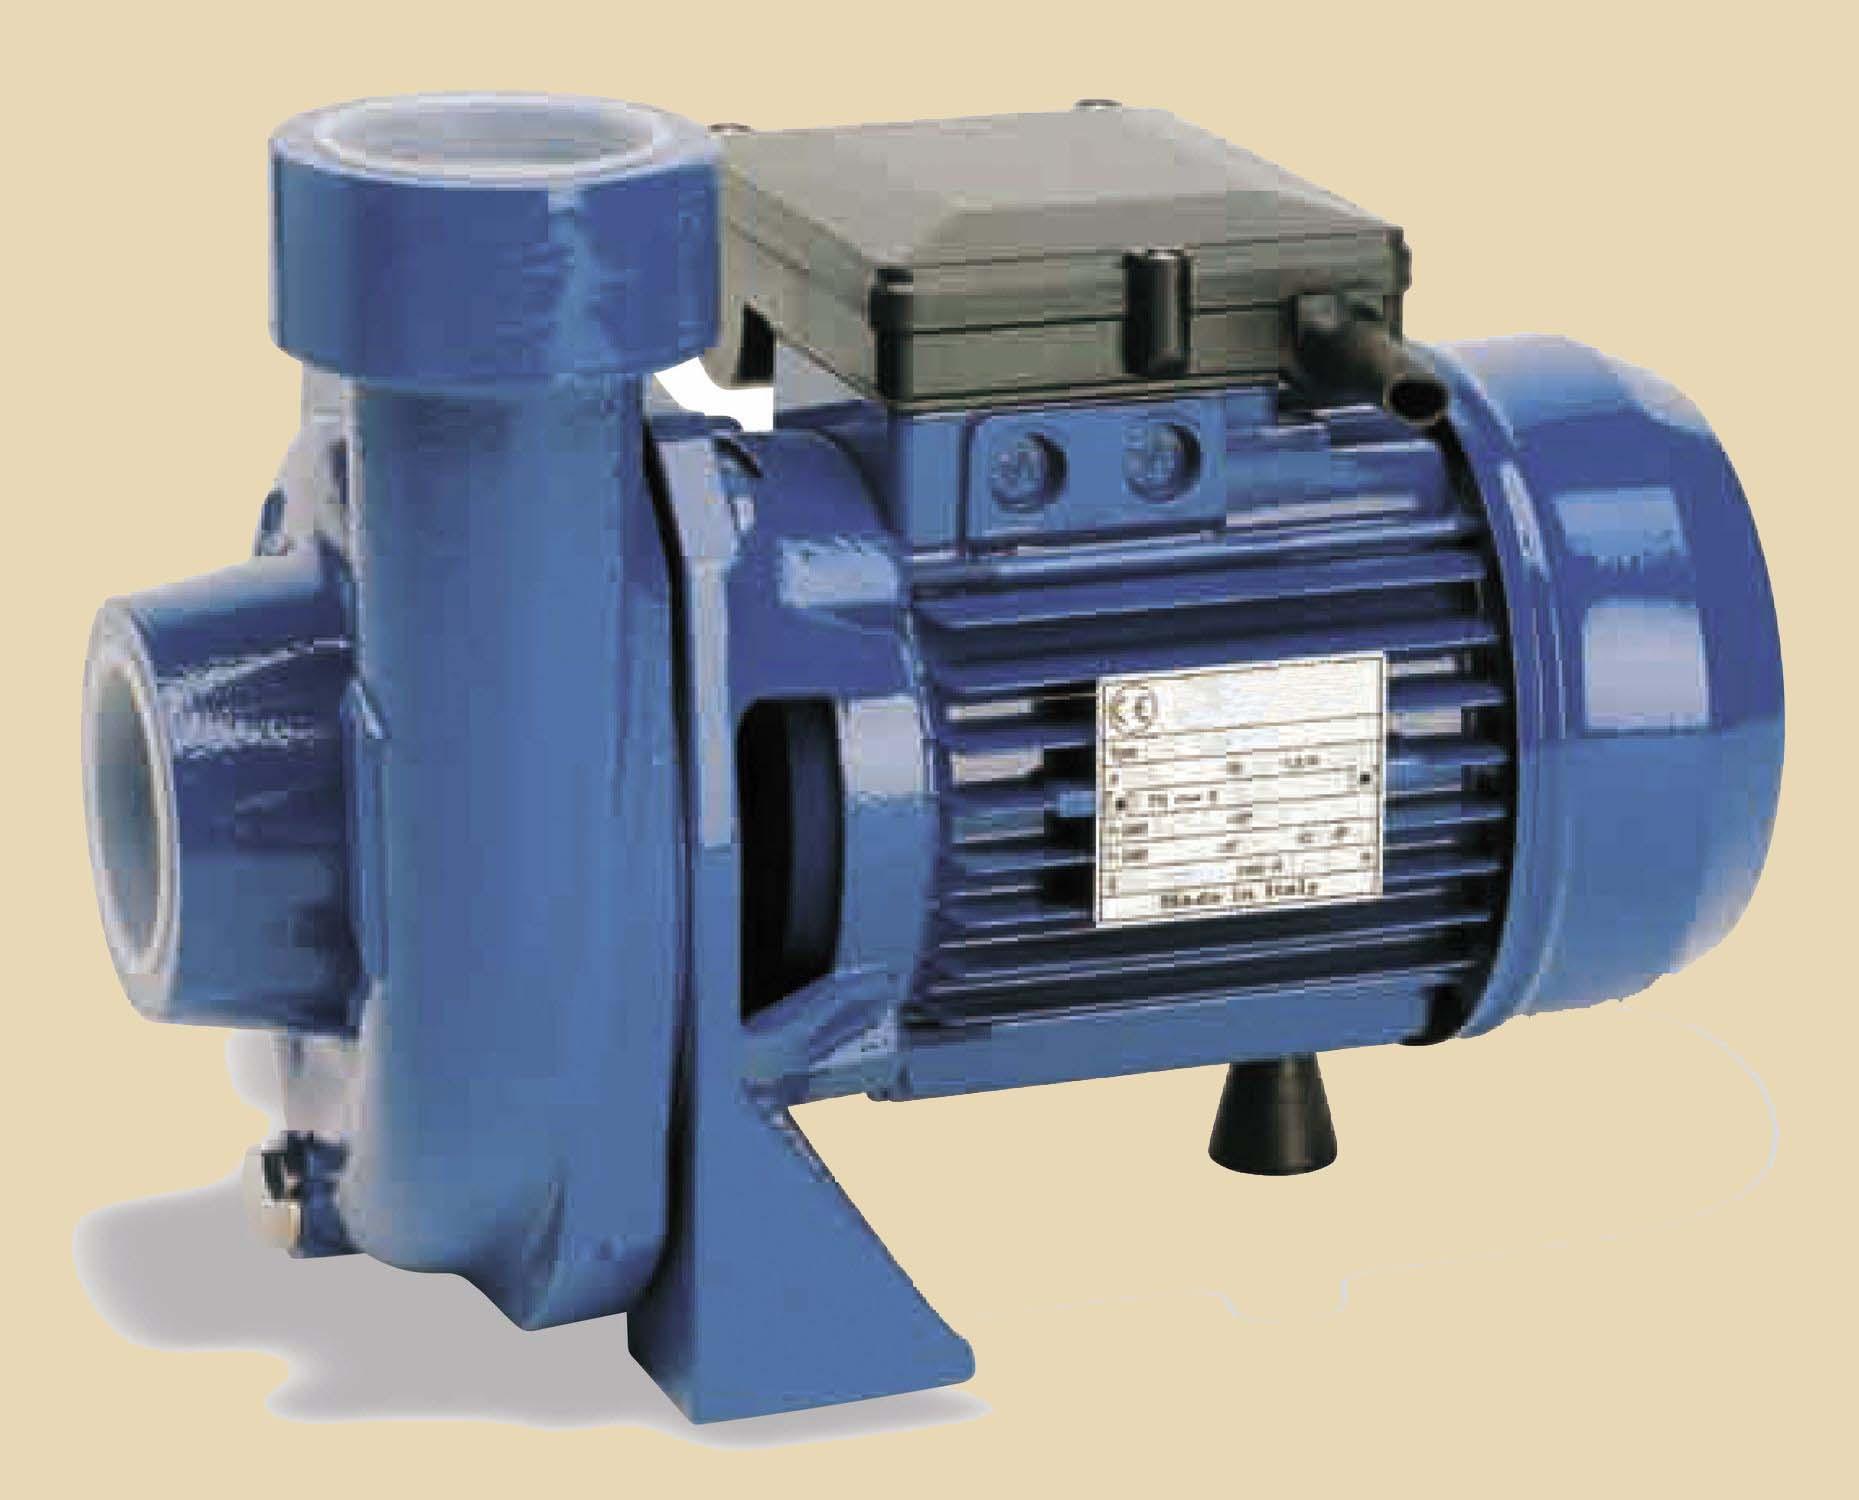 centrifugal-pump-water-40807-2801931